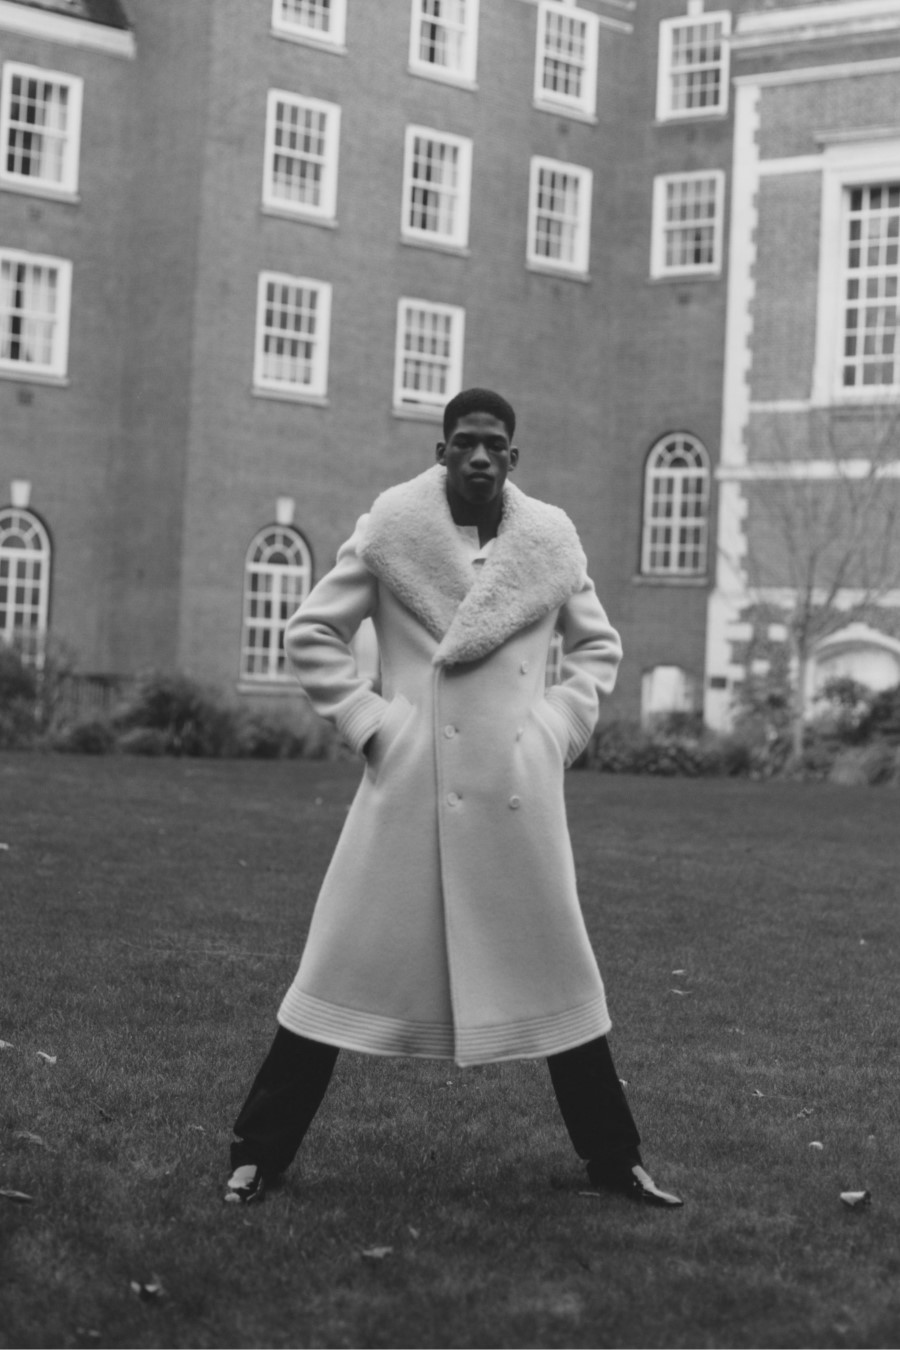 Wales Bonner Fall Winter 2021 - Paris Fashion Week Men's